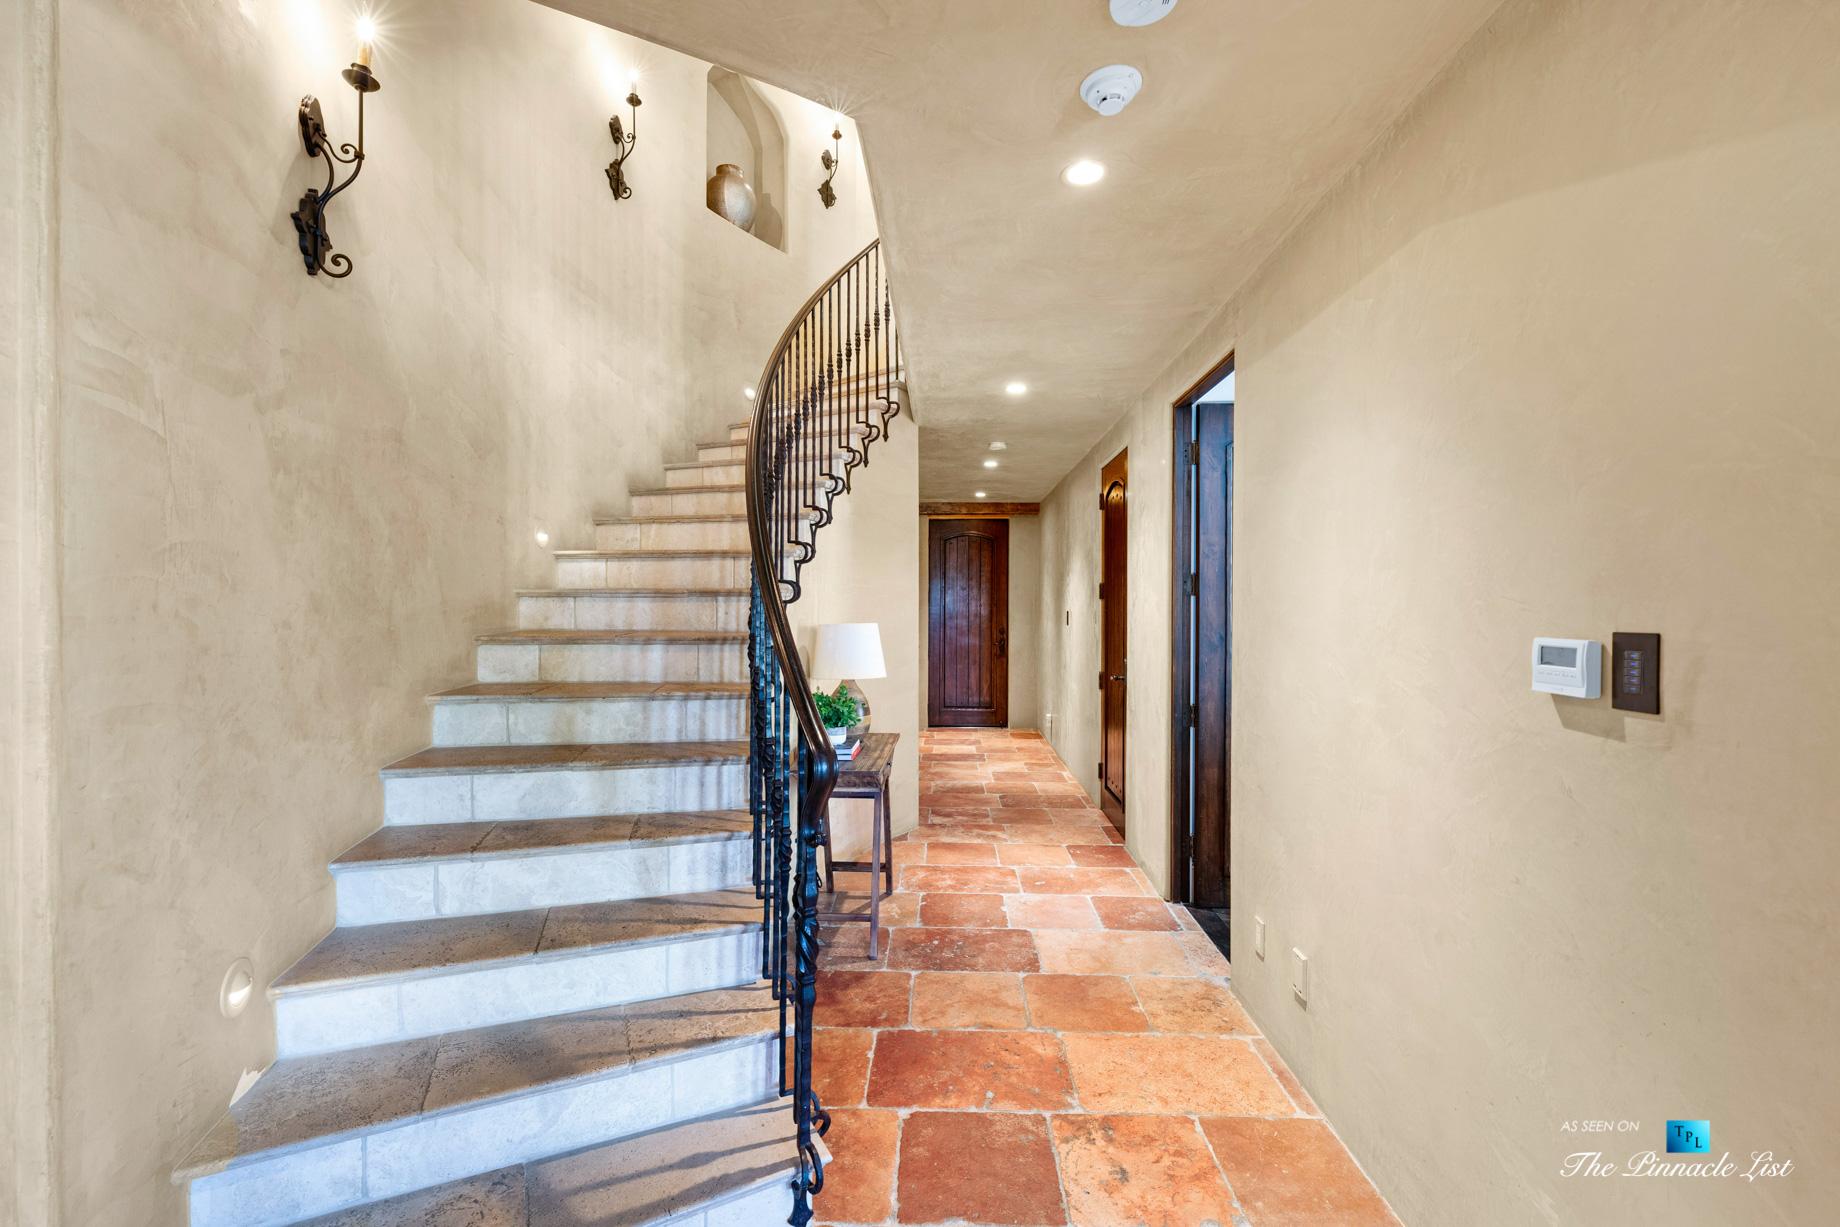 216 7th St, Manhattan Beach, CA, USA – Luxury Real Estate – Coastal Villa Home – Stairs and Hallway